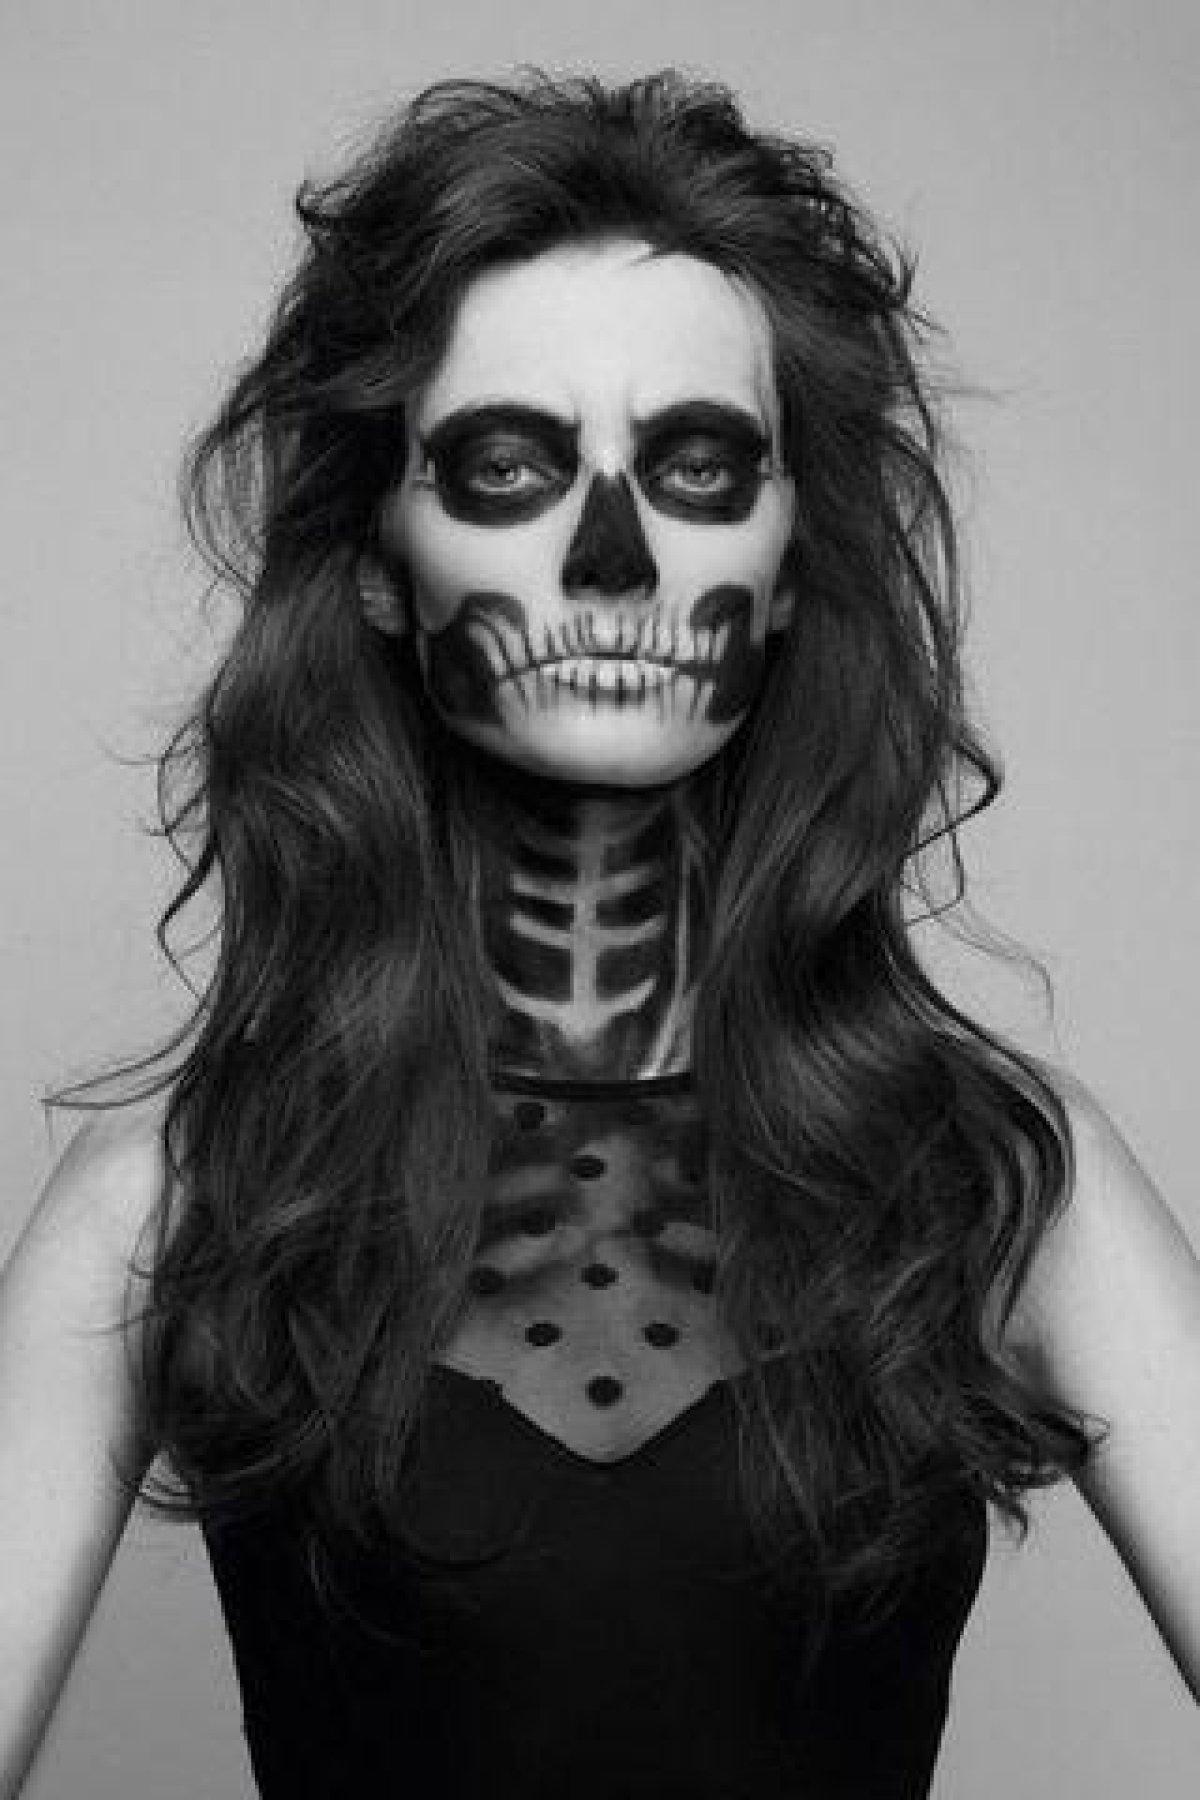 Disenos De Maquillaje Para Halloween Fotogaleria Moda Y Belleza - Maquillage-para-halloween